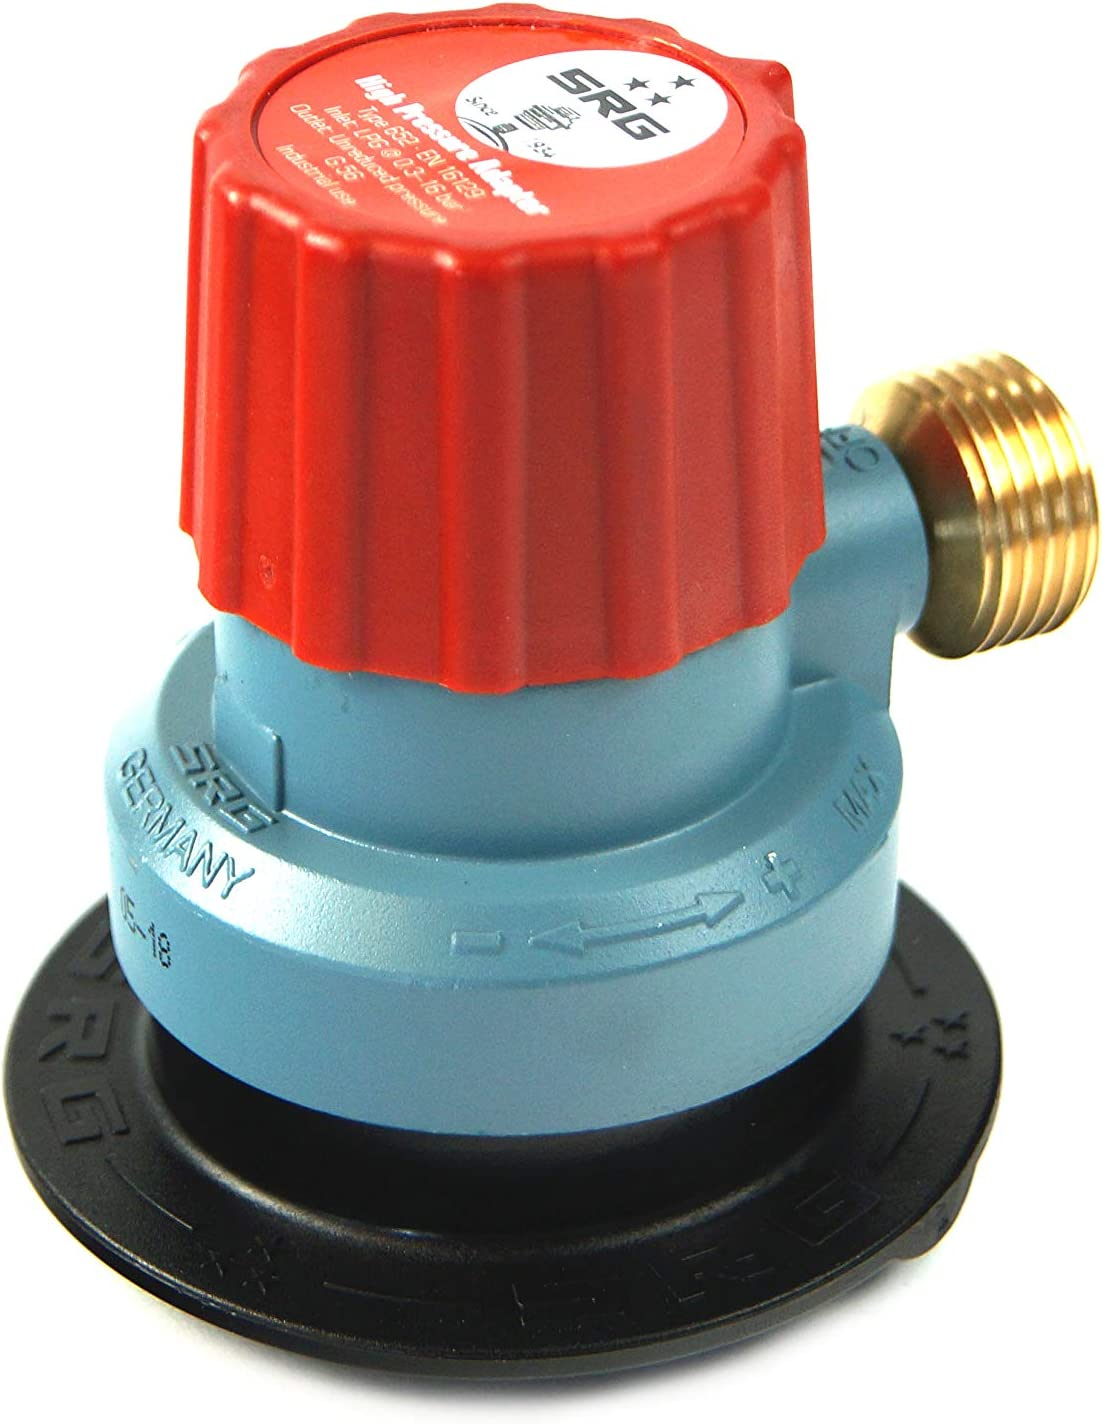 Drehmeister Adaptador SRG Clip On Jumbo 35mm x KLF - para Botellas de Gas